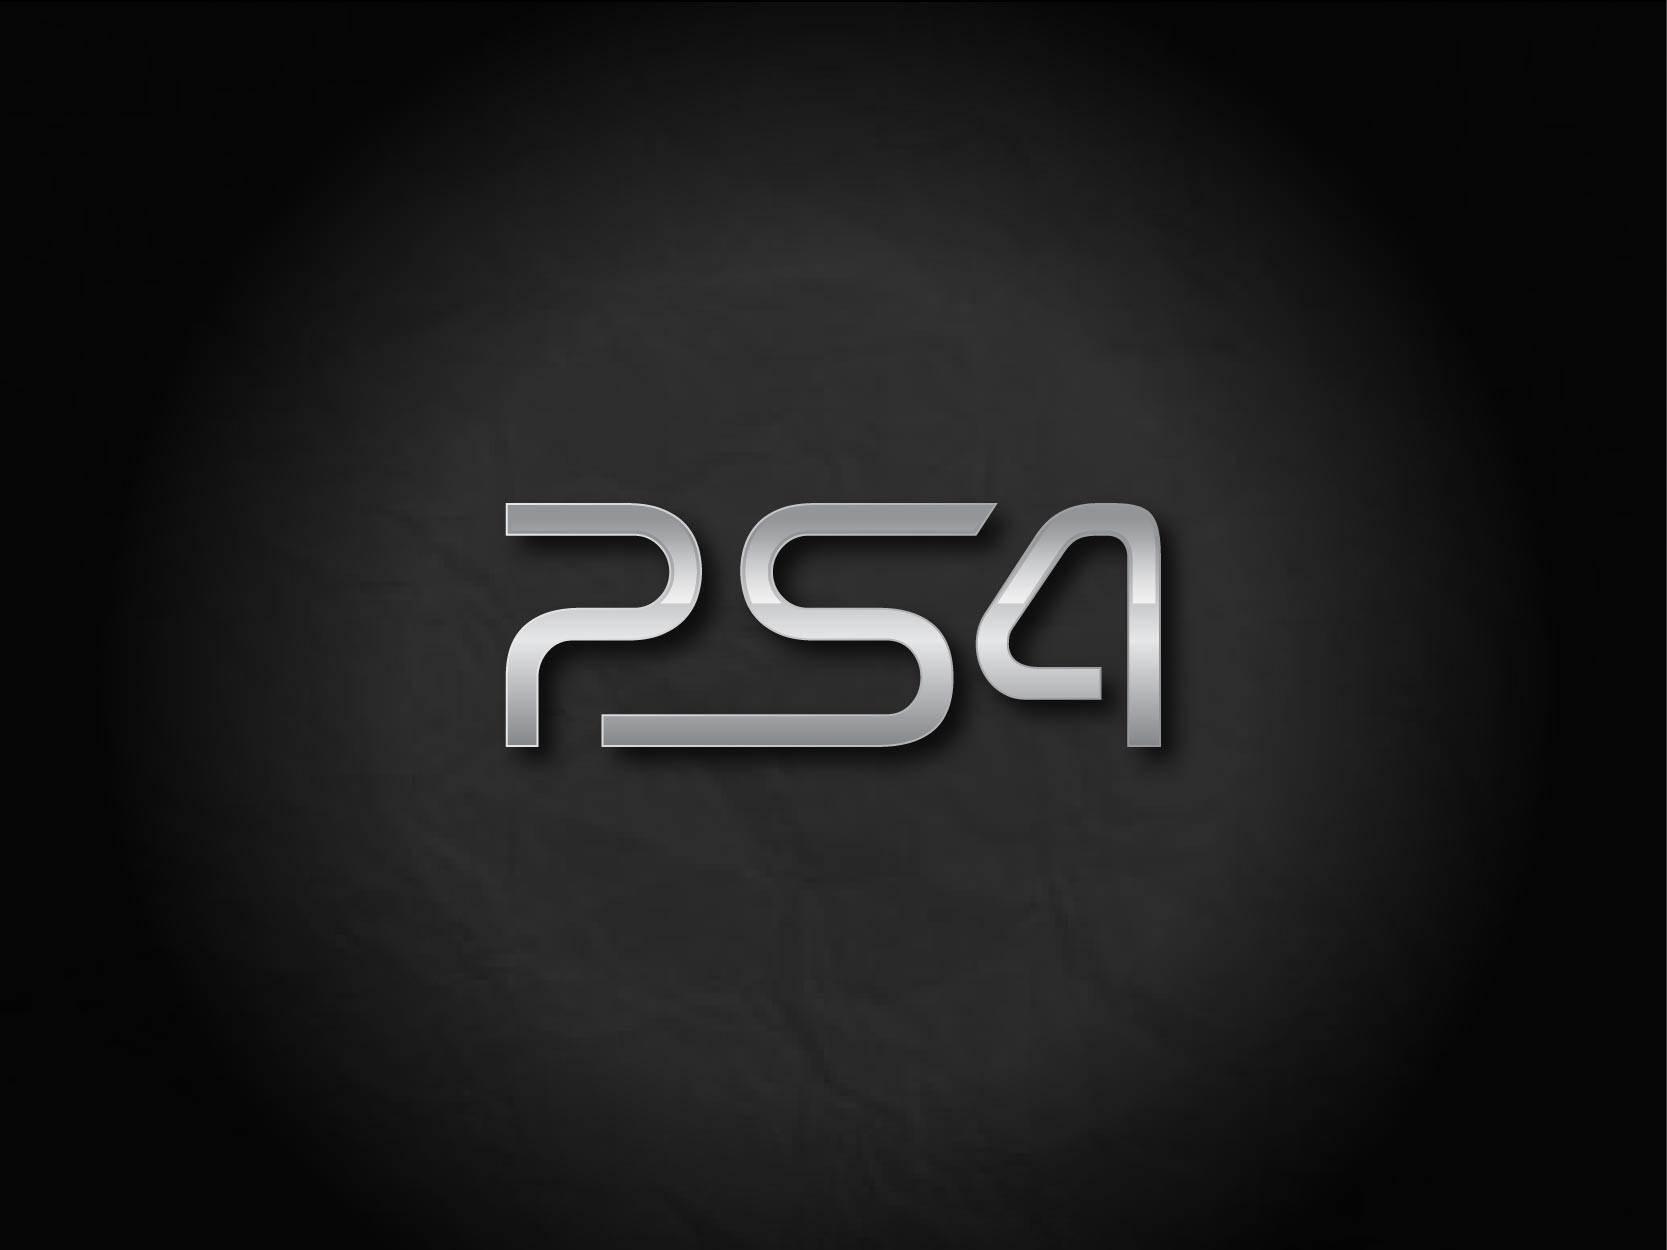 ps4 logo 1